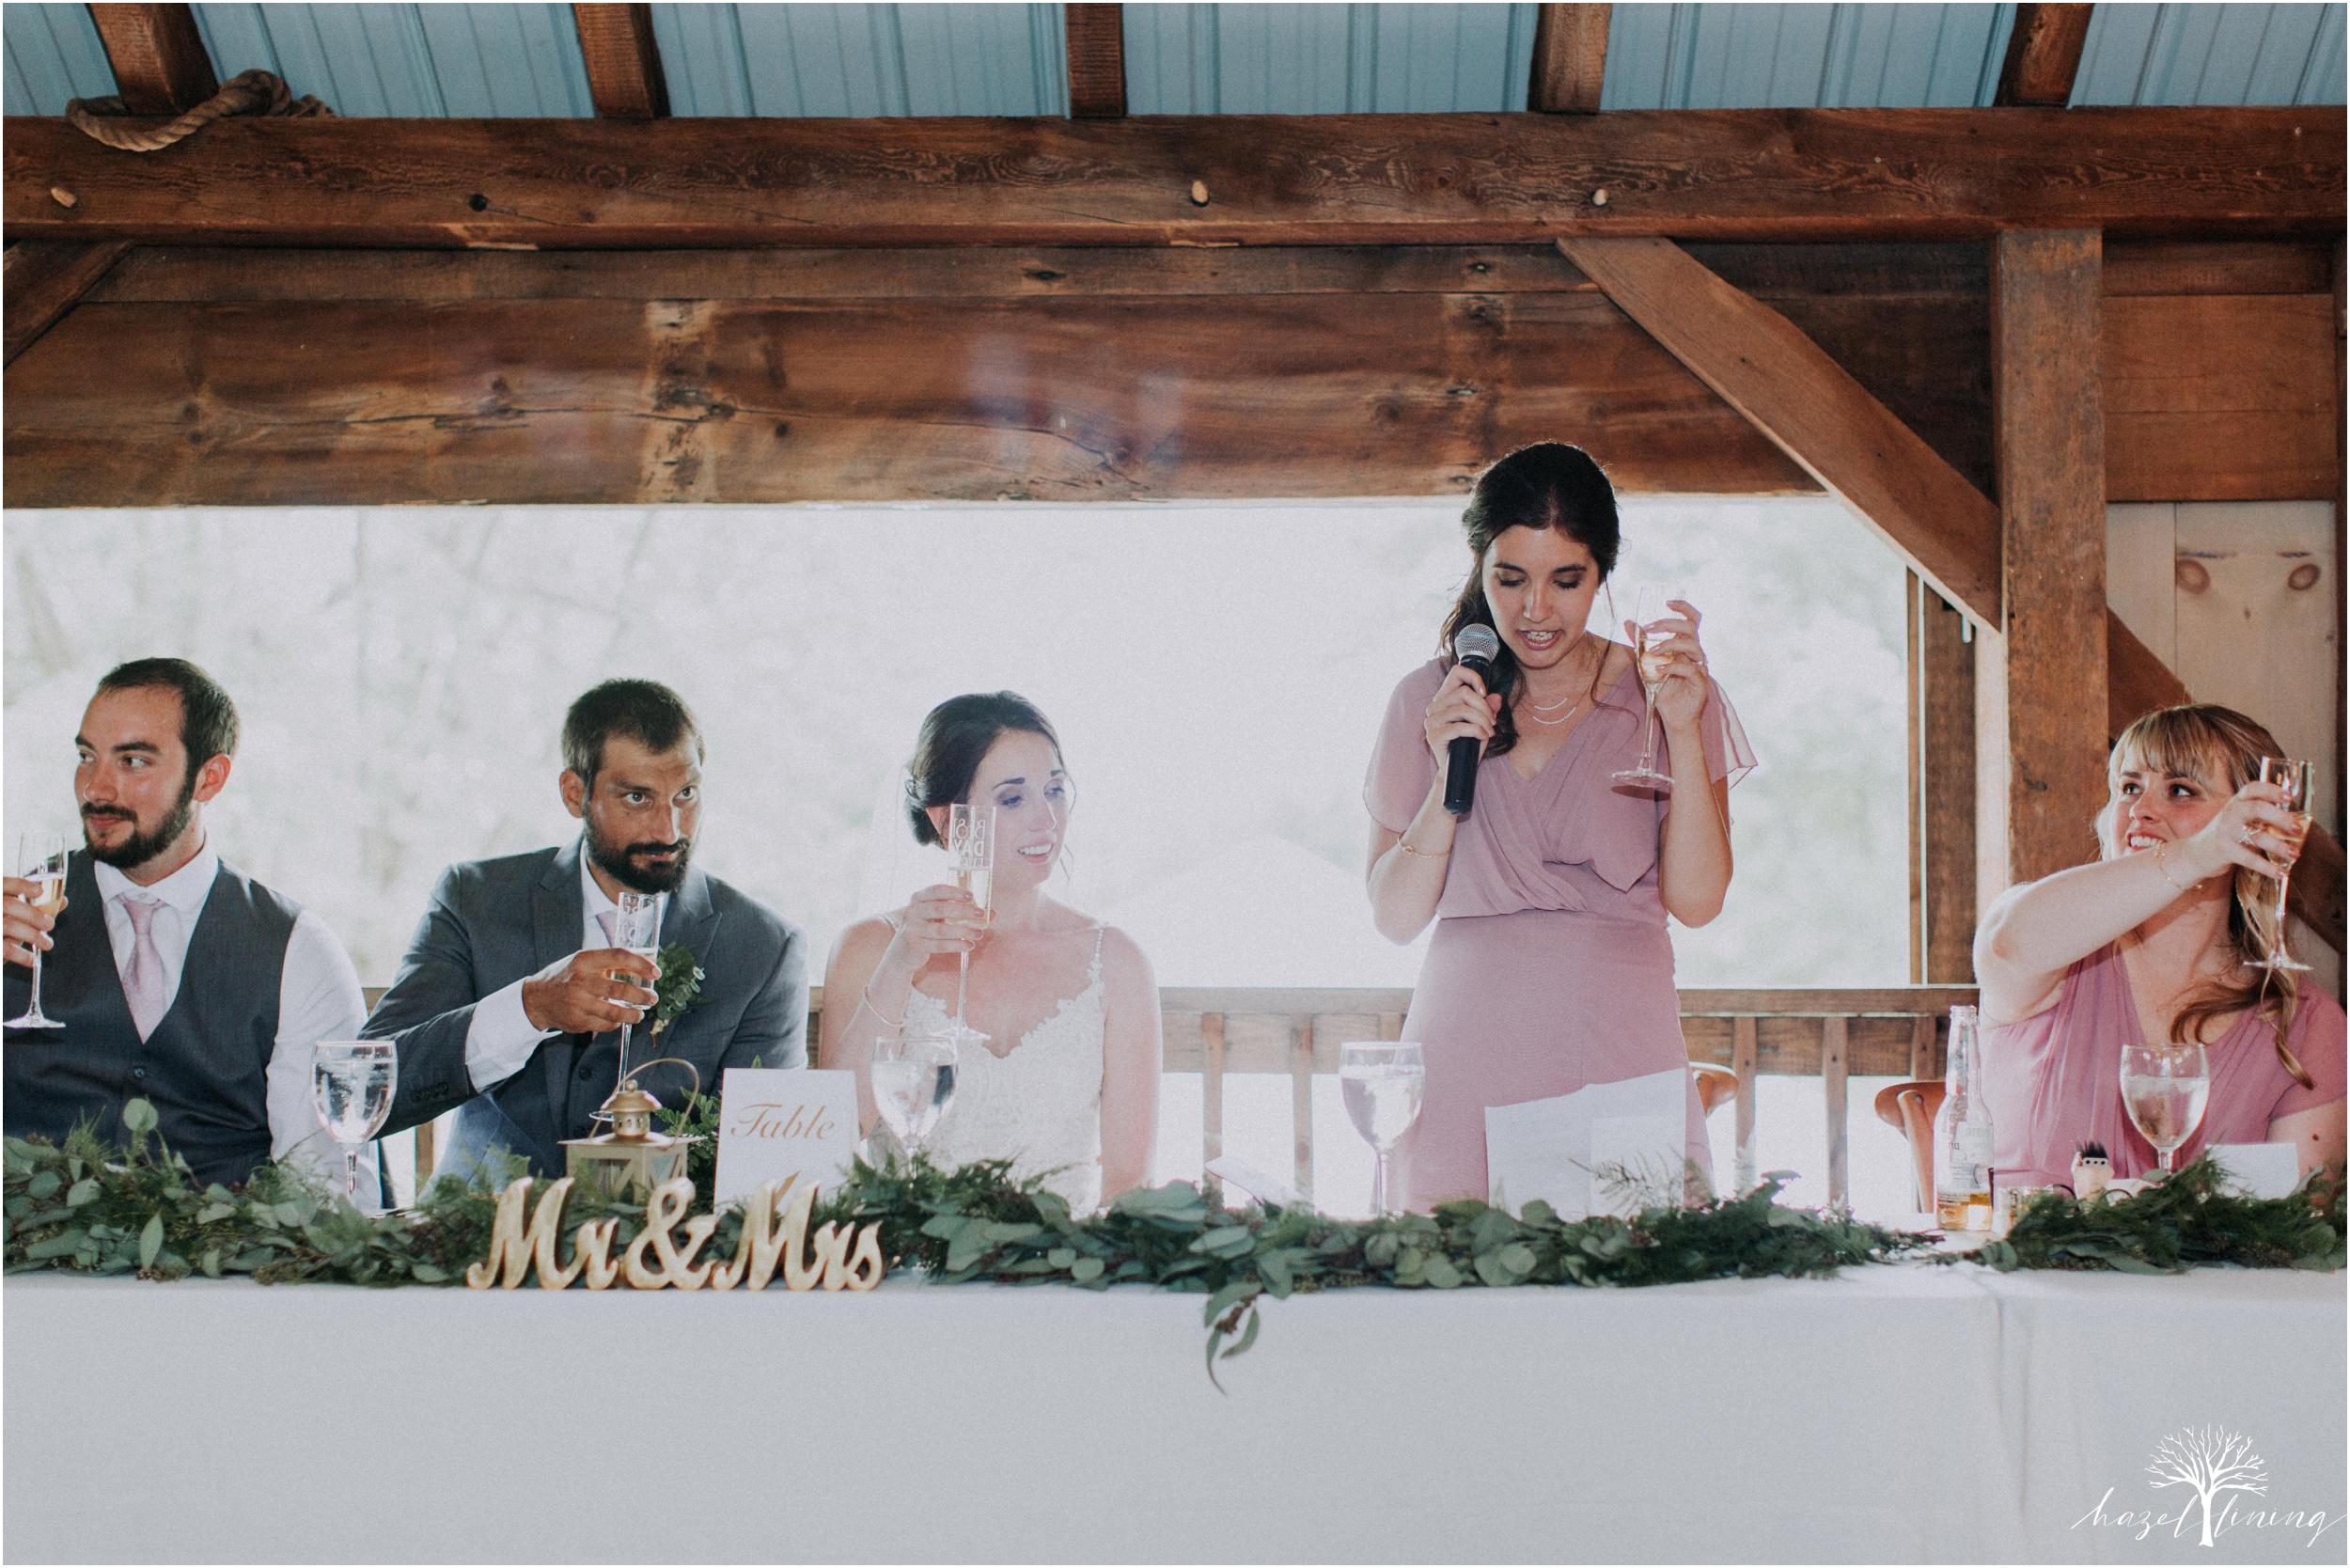 hazel-lining-travel-wedding-elopement-photography-lisa-landon-shoemaker-the-farm-bakery-and-events-bucks-county-quakertown-pennsylvania-summer-country-outdoor-farm-wedding_0123.jpg